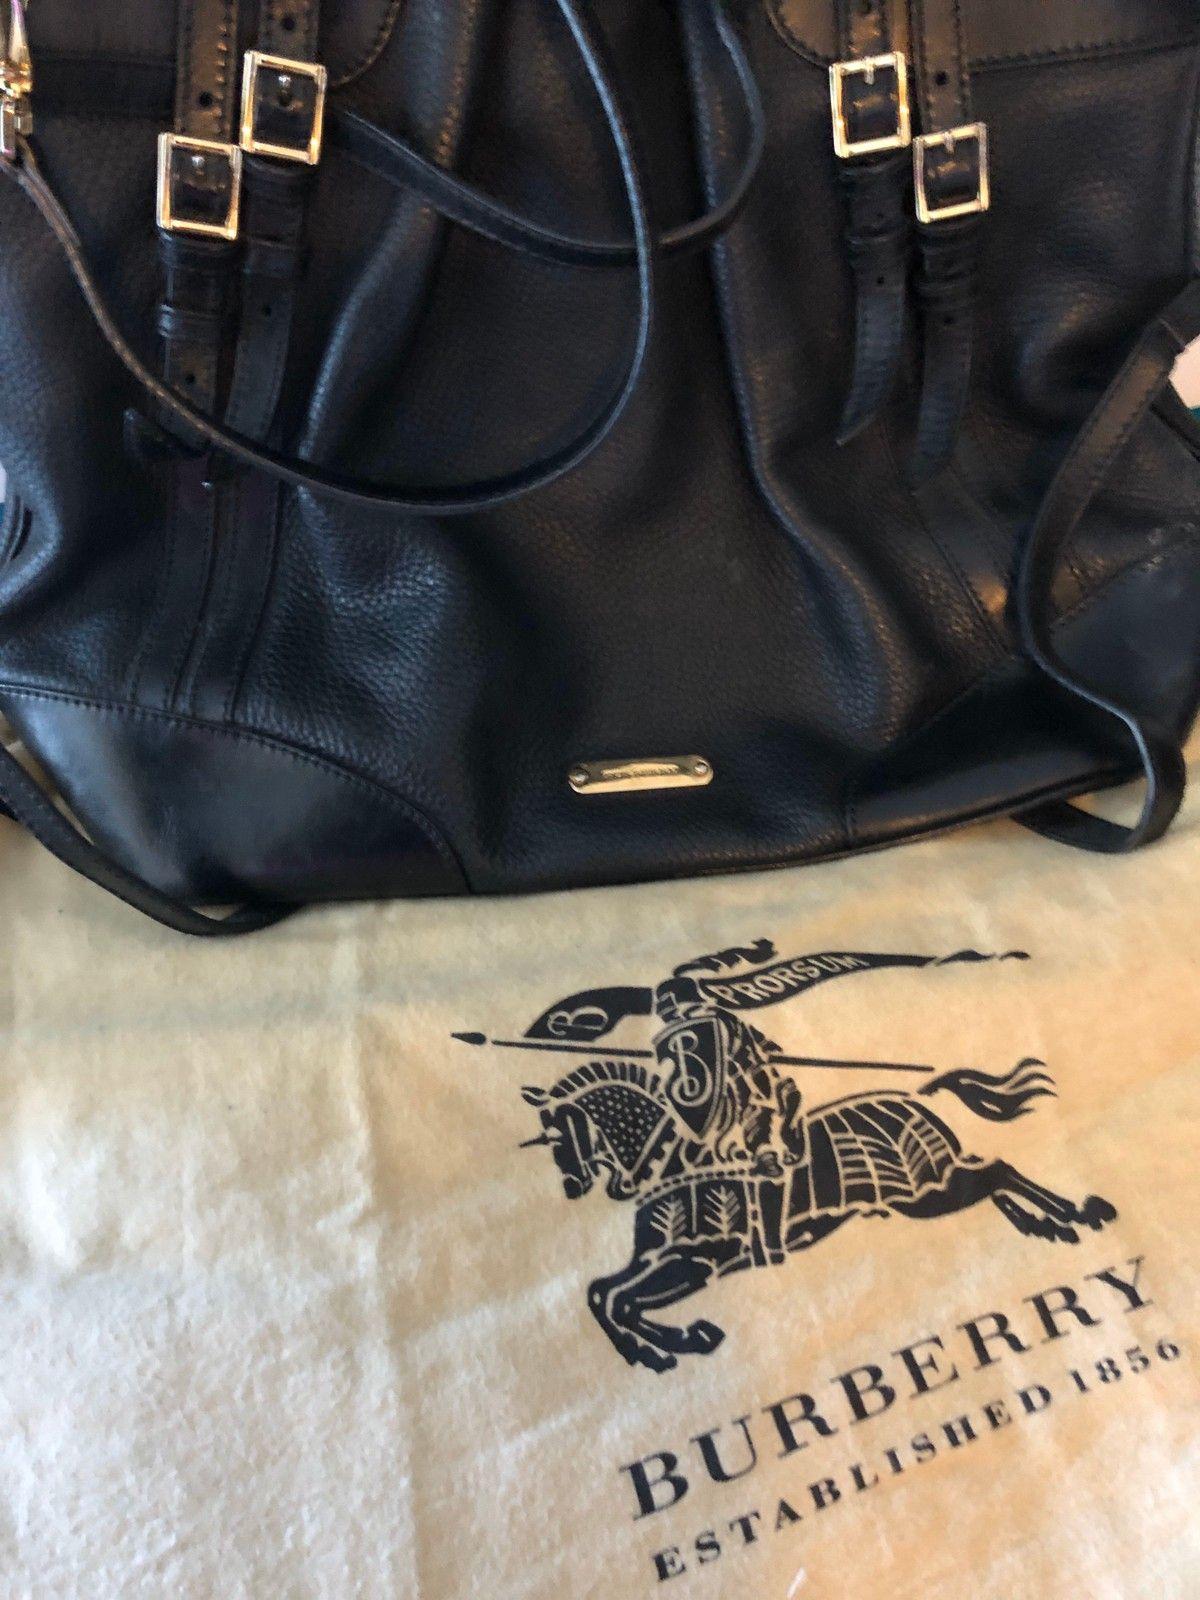 Burberry veske | FINN.no